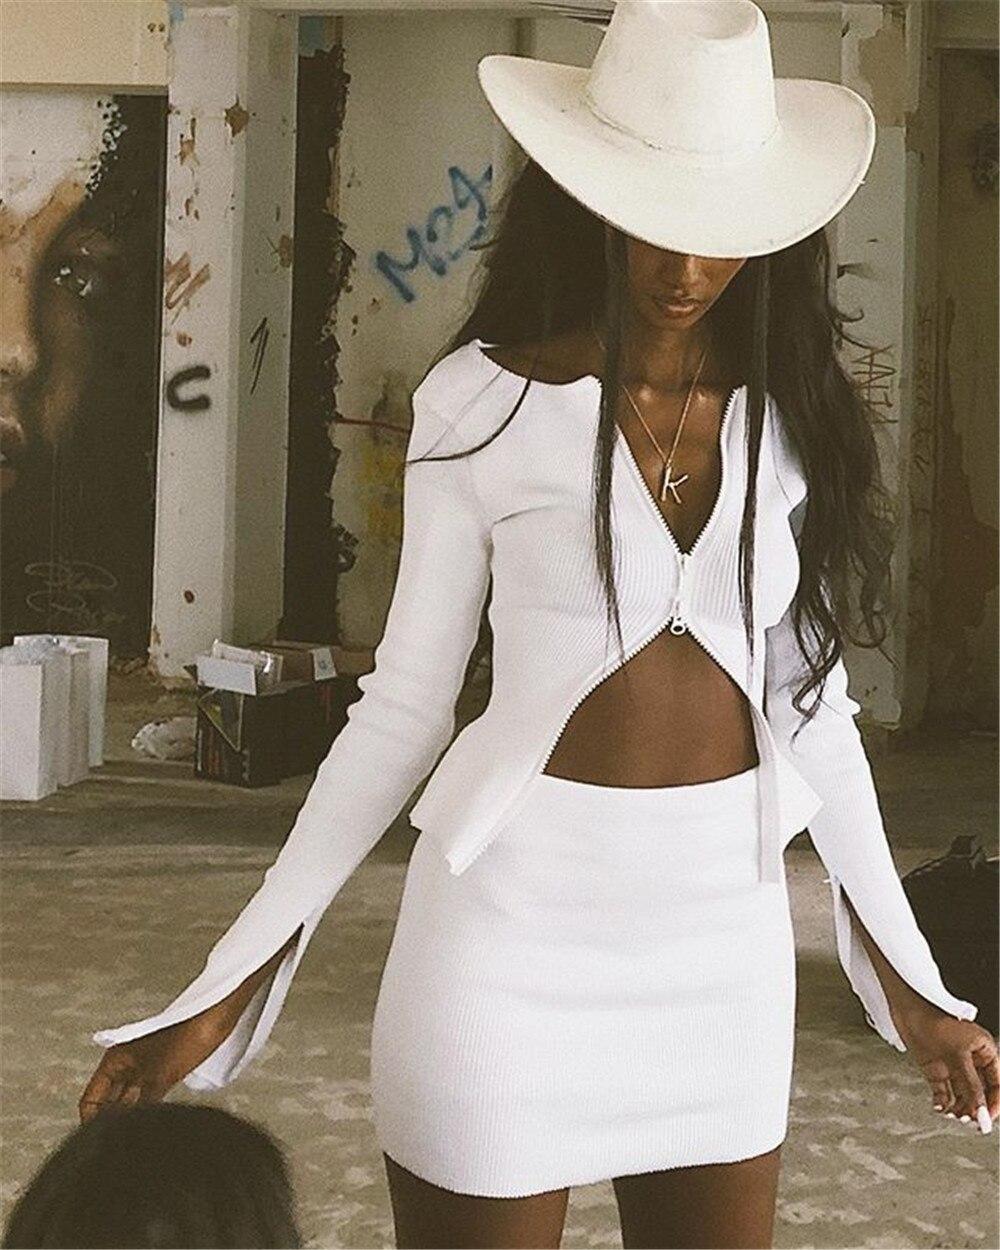 HTB1TcundUGF3KVjSZFvq6z nXXav KGFIGU kylie jenner ribbed Tops jackets Autumn long sleeve zipper coats sexy streetwear Ladies white knit kimono casaco feminino